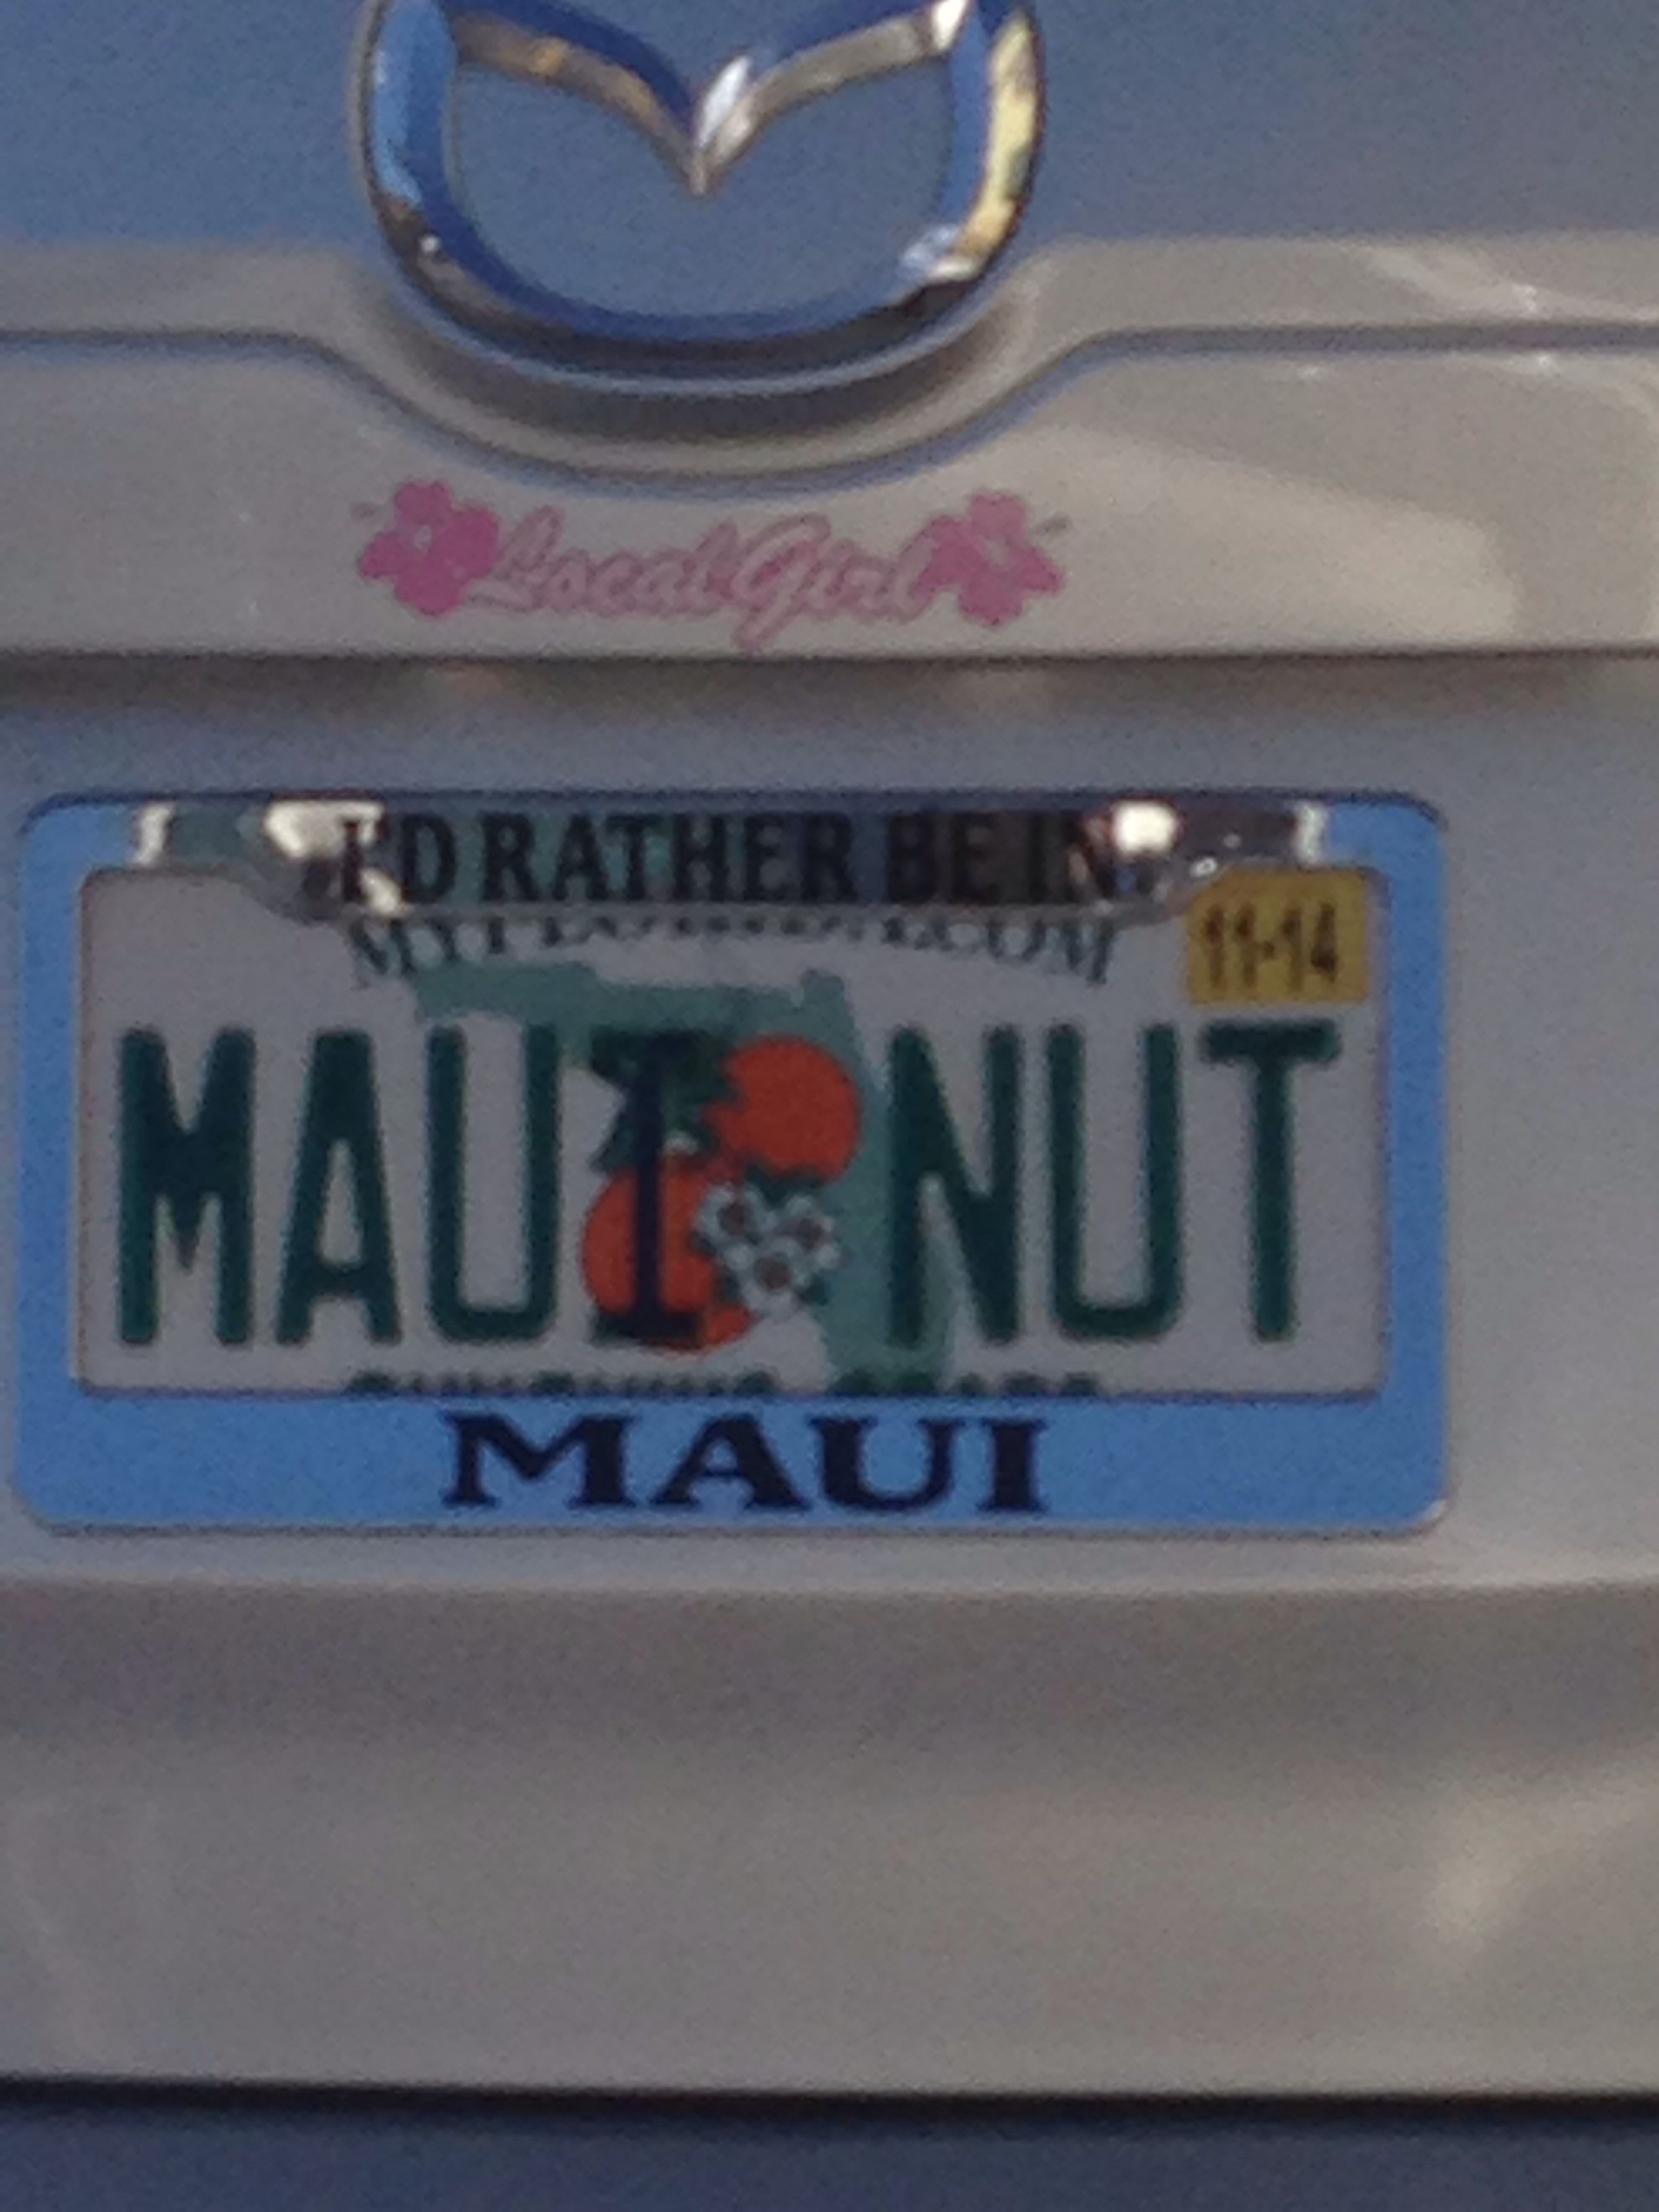 Maui Nut Plate Vanity License Plates Cool License Plates Vanity Plate [ 3264 x 2448 Pixel ]